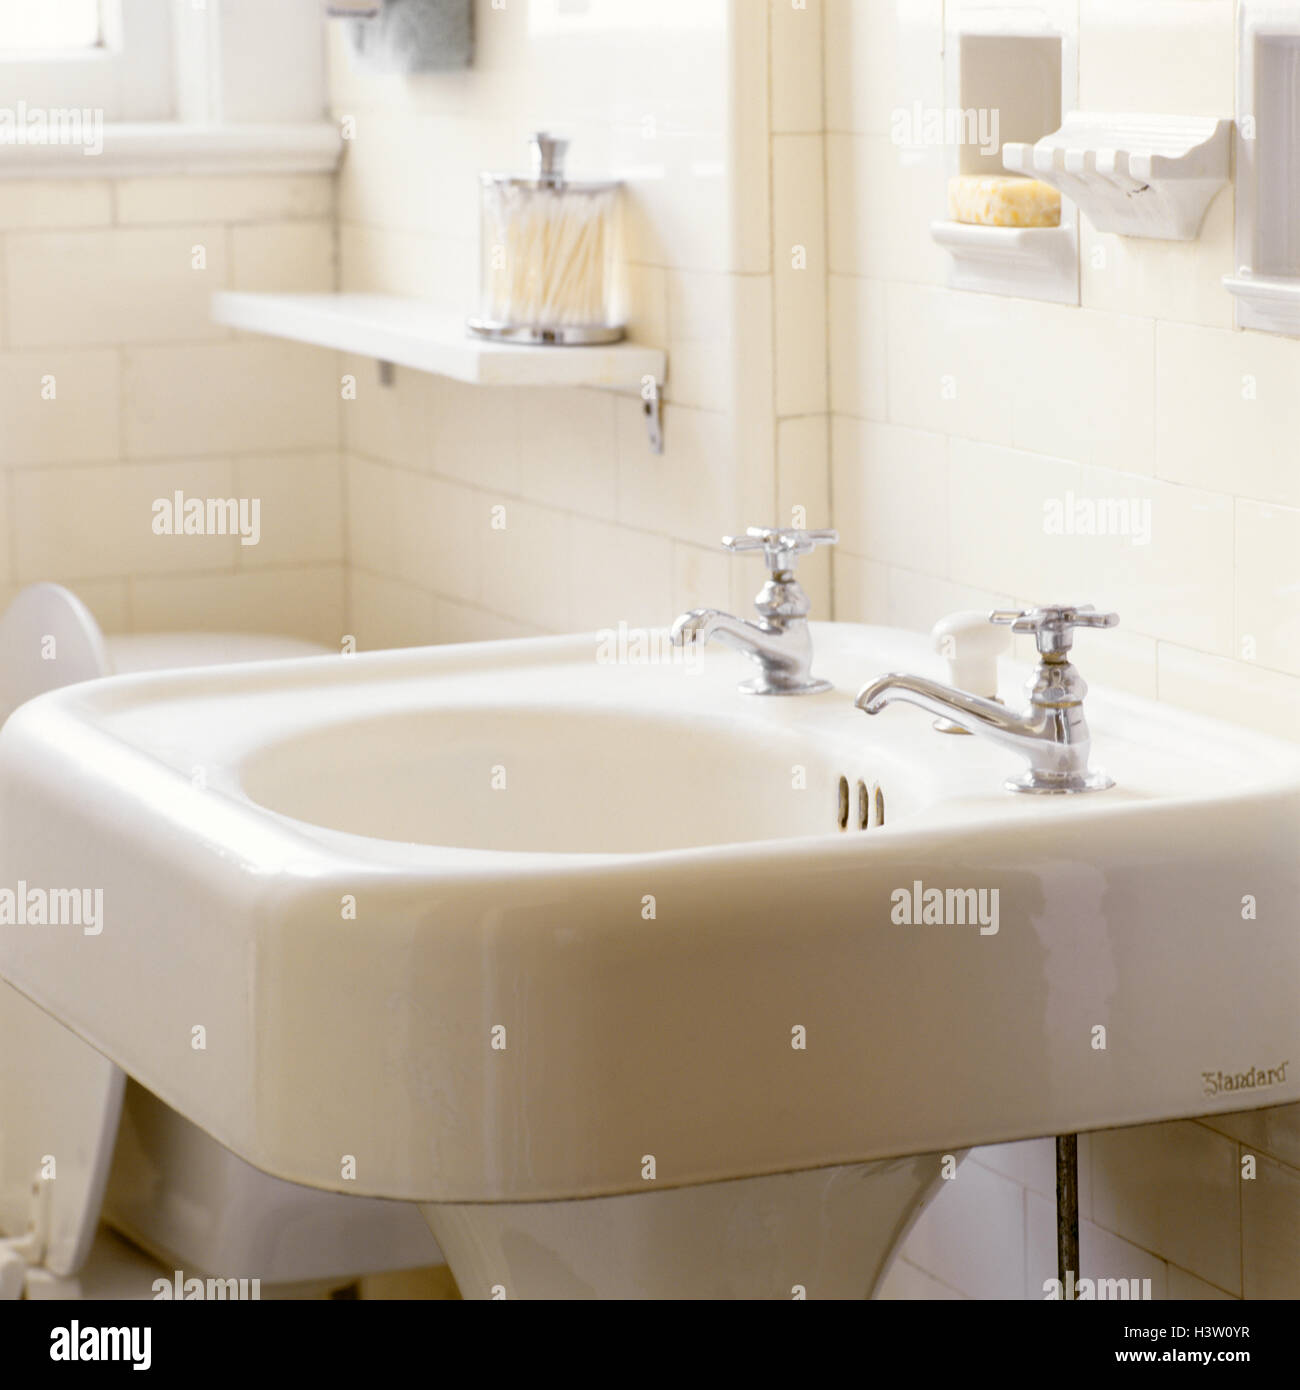 Vintage Sink Stock Photos & Vintage Sink Stock Images - Alamy